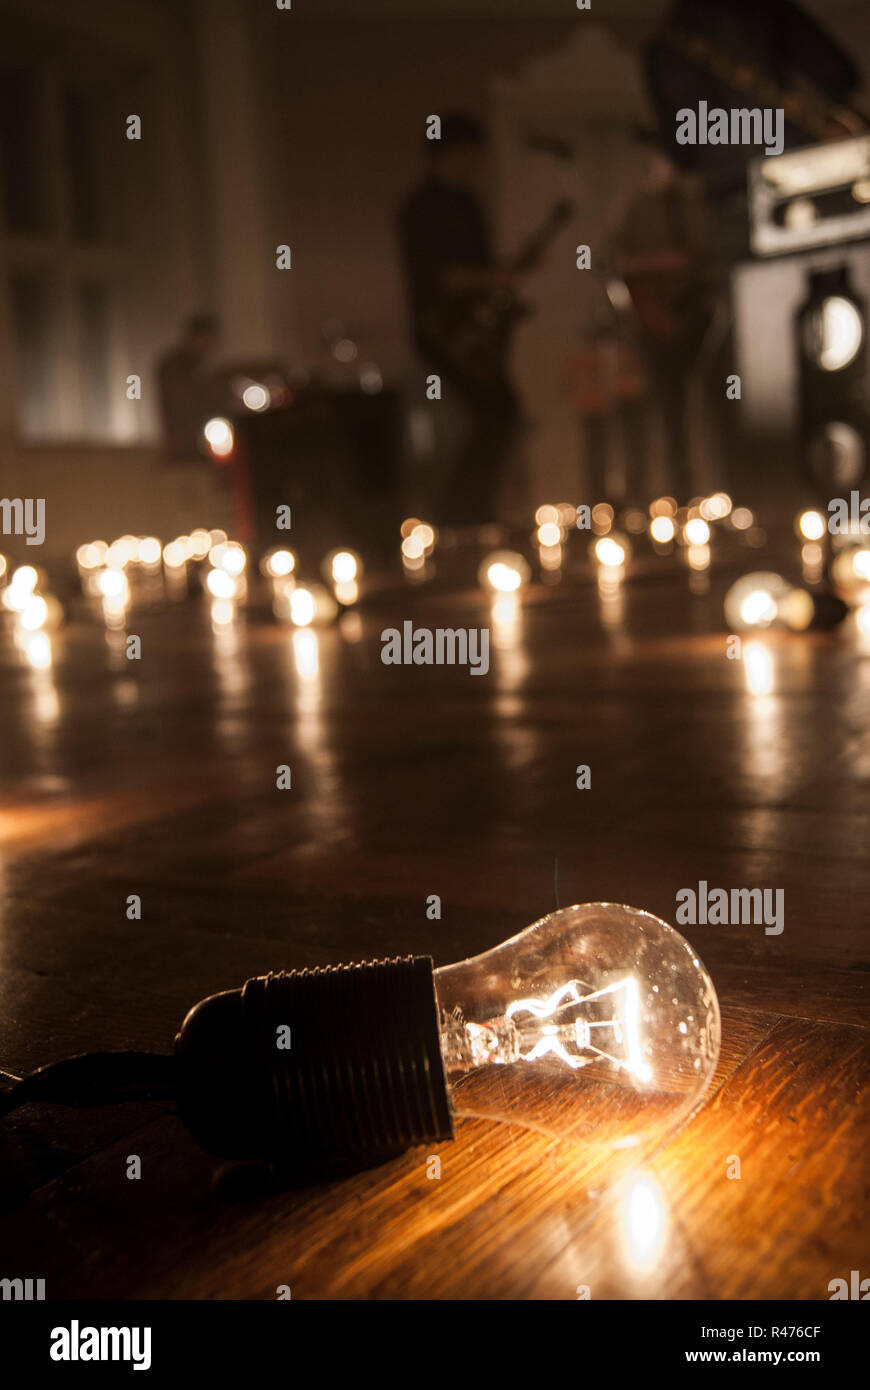 https www alamy com incandescent light bulbs rock music video image226352127 html